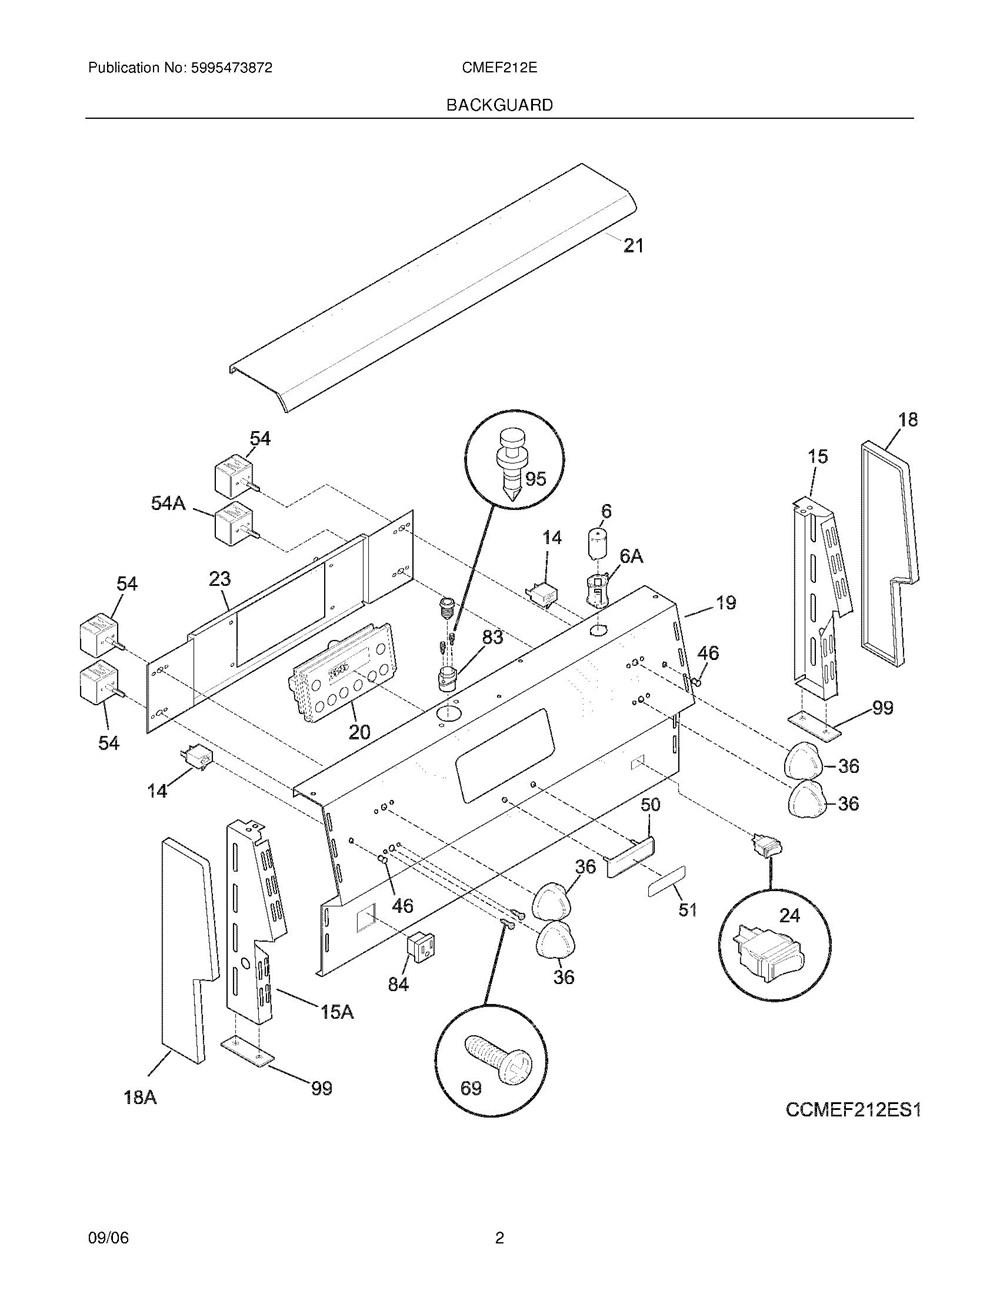 Cmef212es2 Frigidaire Company Backguard 05body 07top Drawer 09door 01cover 10wiring Diagram